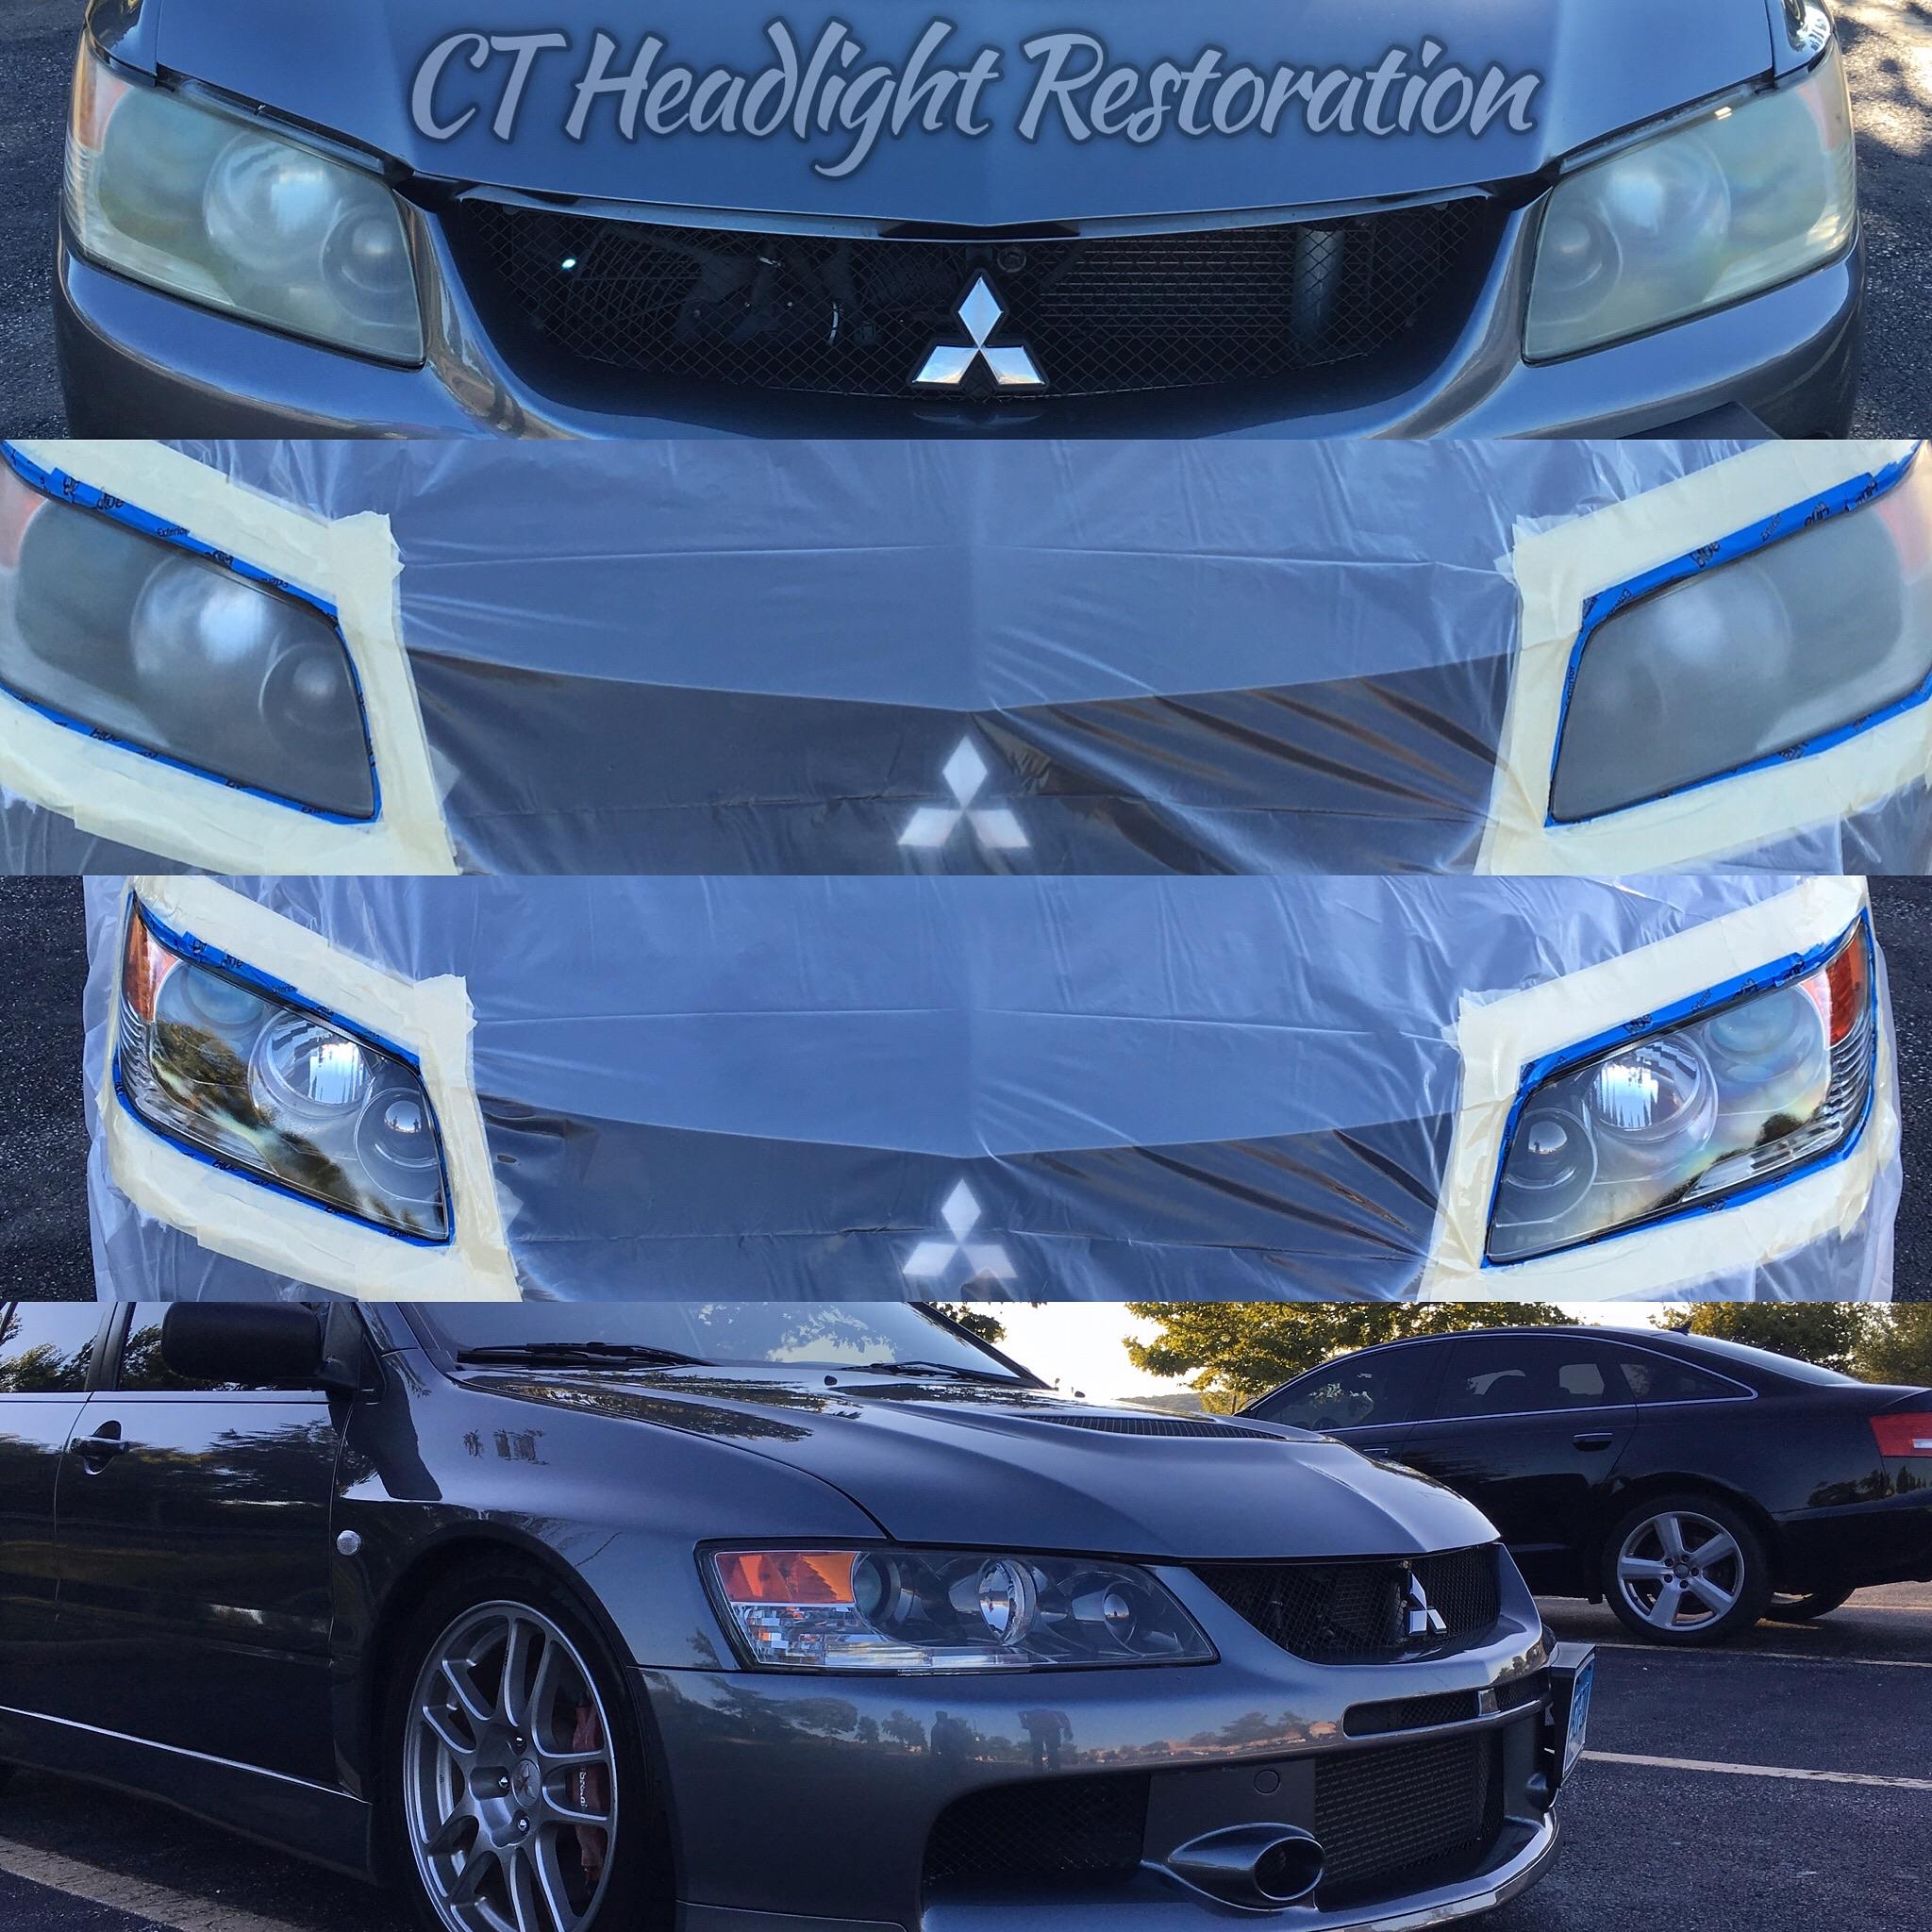 Mitsubishi Headlight Restoration.jpg